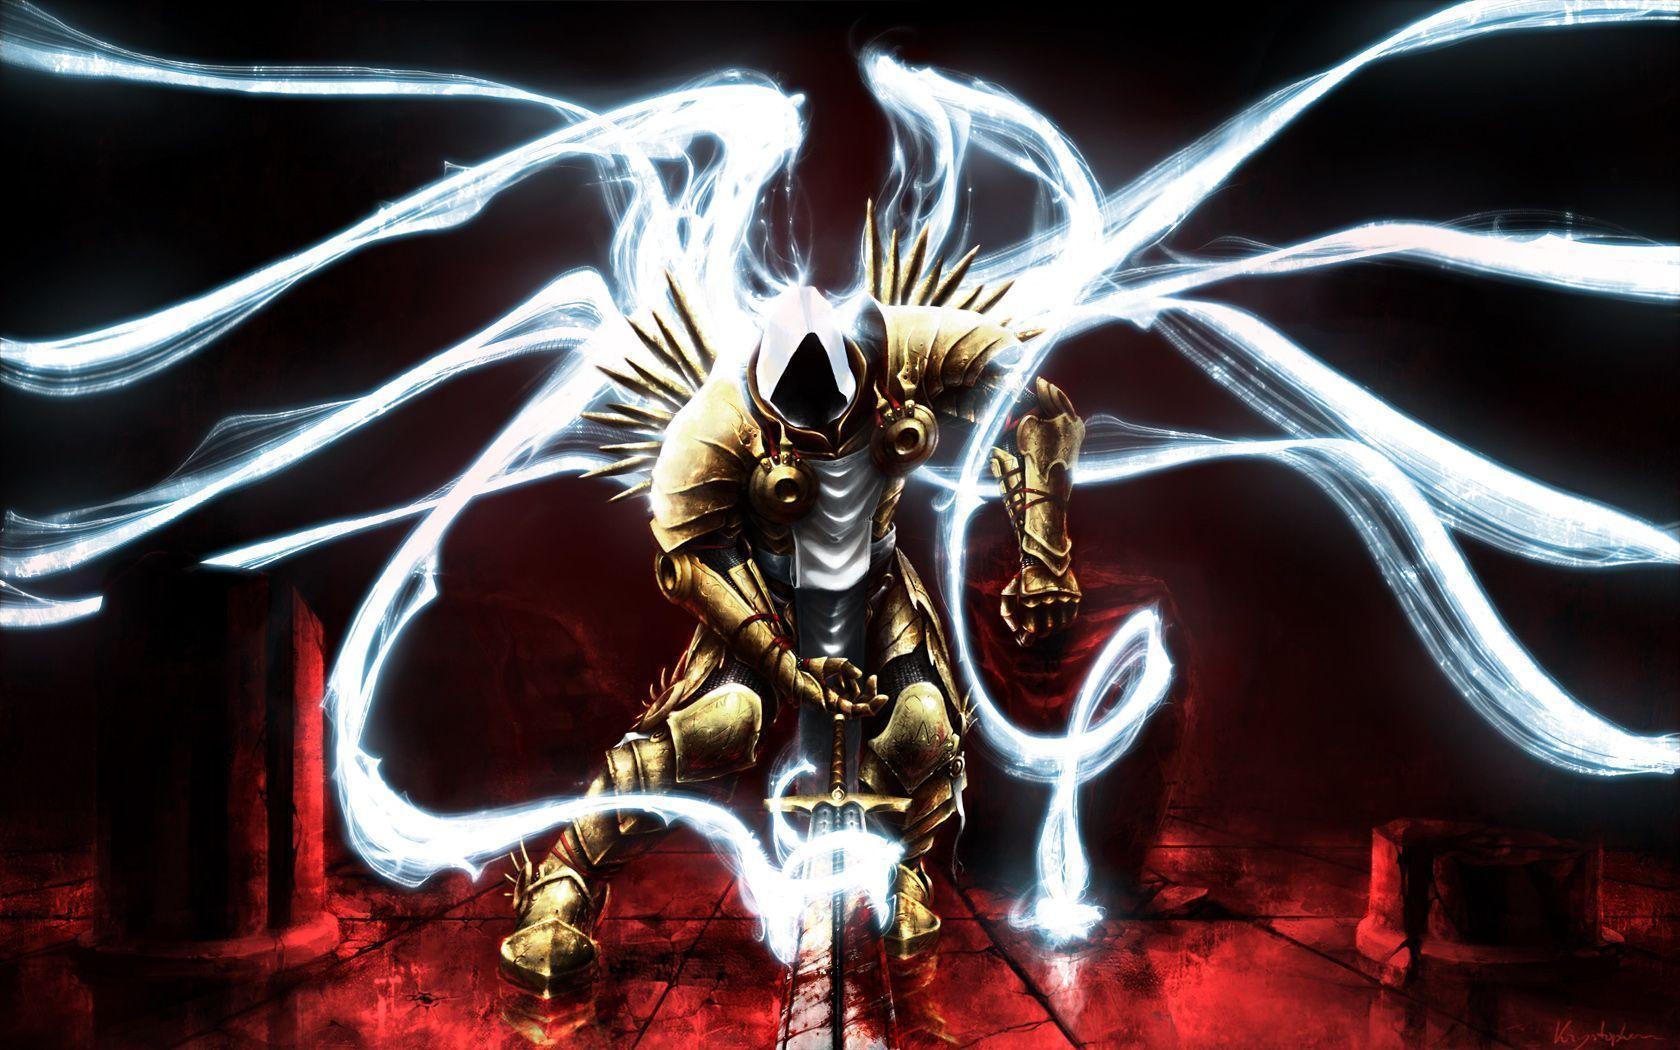 Diablo 3 Hd Wallpaper Design Ideas ~ Diablo Games Pc Hd Wallpaper ...